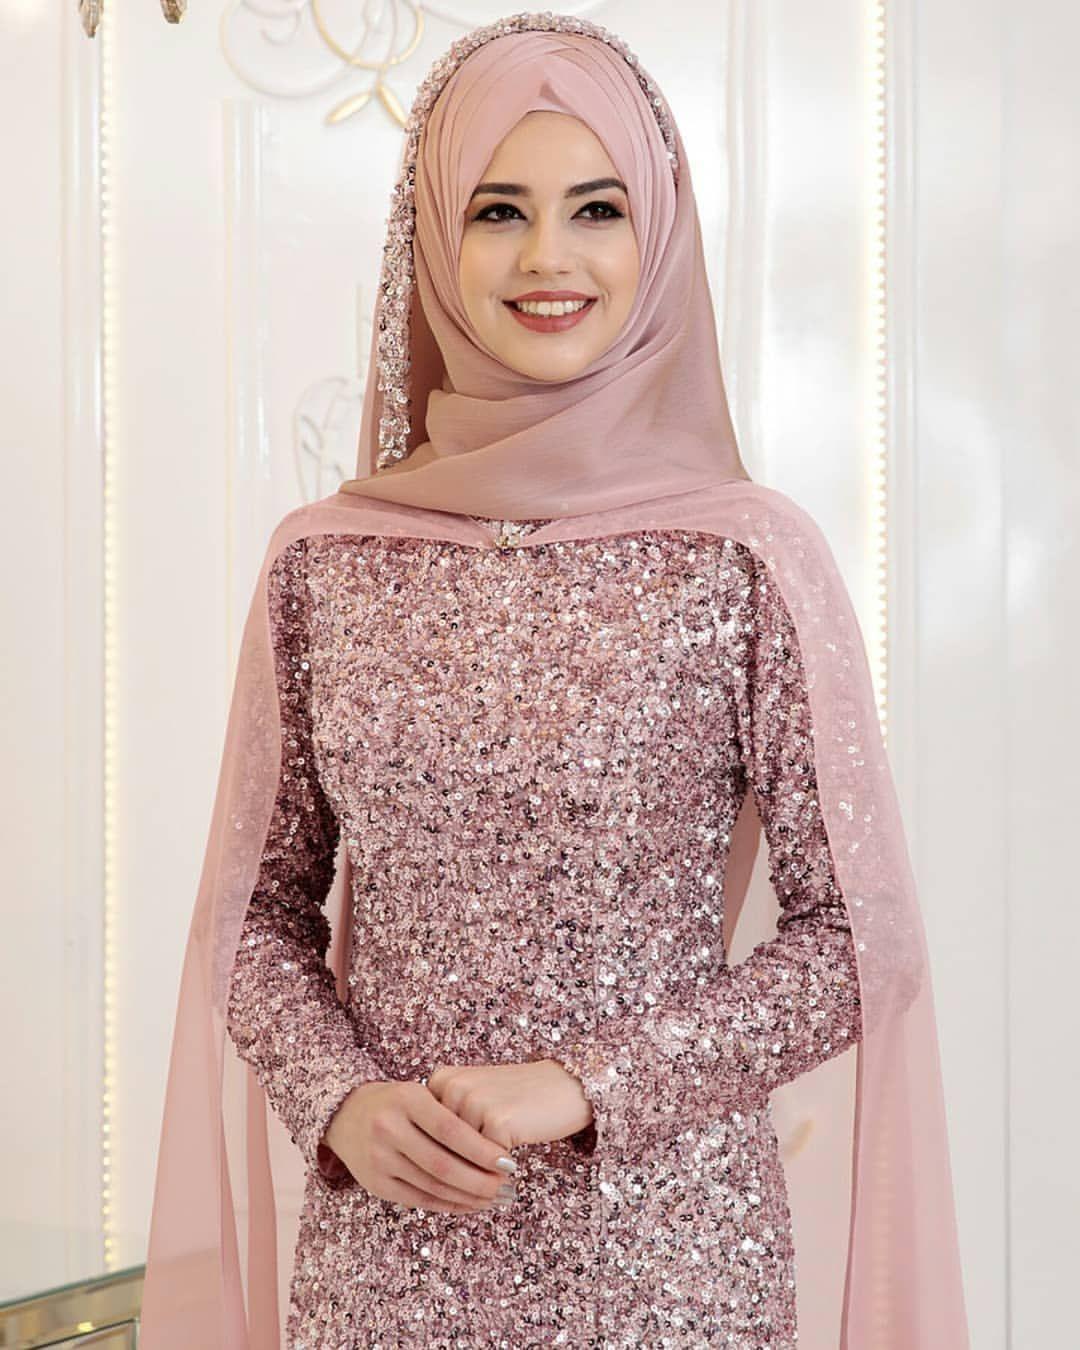 Pelerinsiz De Kullanilabilir Pinar Sems Gunyeni Abiye Ekru Mor Lacivert Pudra Gold Bede Wedding Hijab Styles Muslim Fashion Modern Hijab Fashion